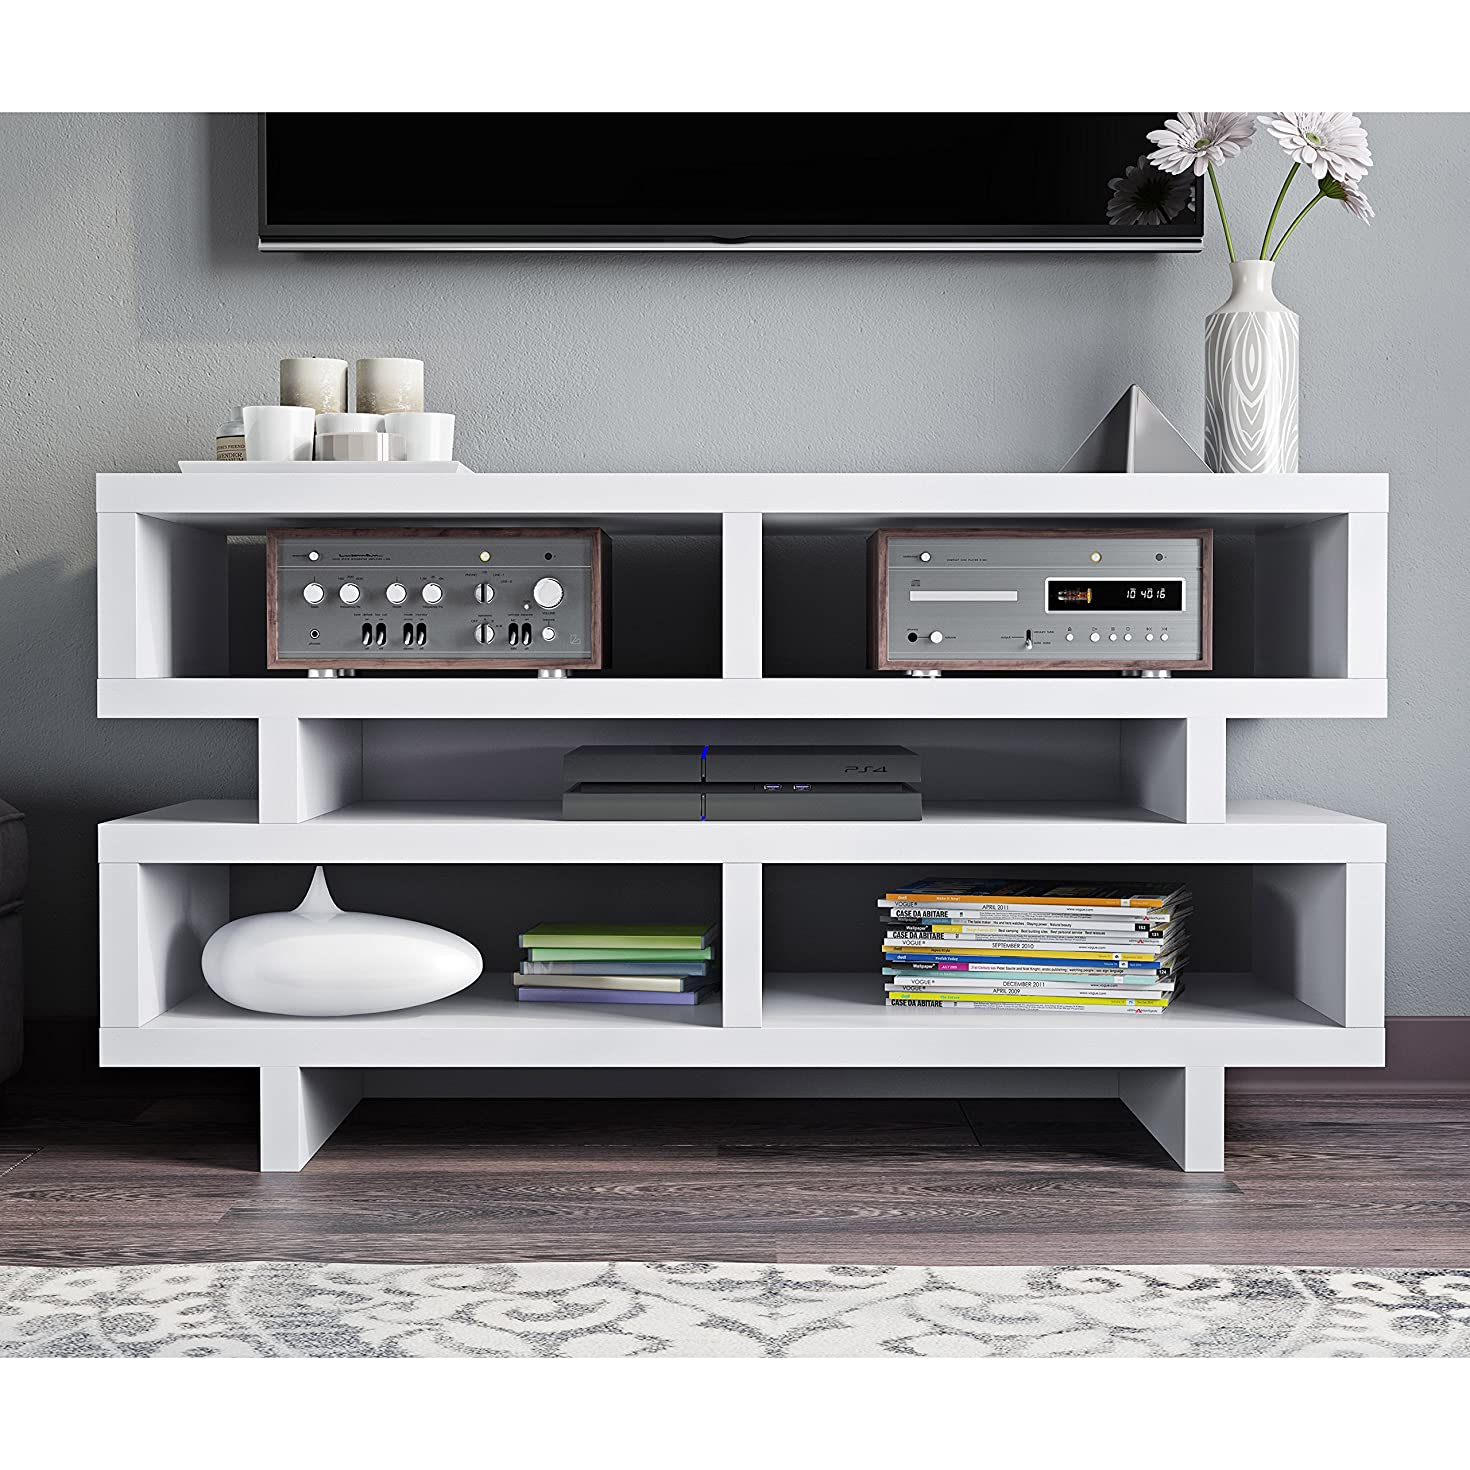 White Modern Geometric Multi Storage Media Compartment Shelf TV Stand Console Table